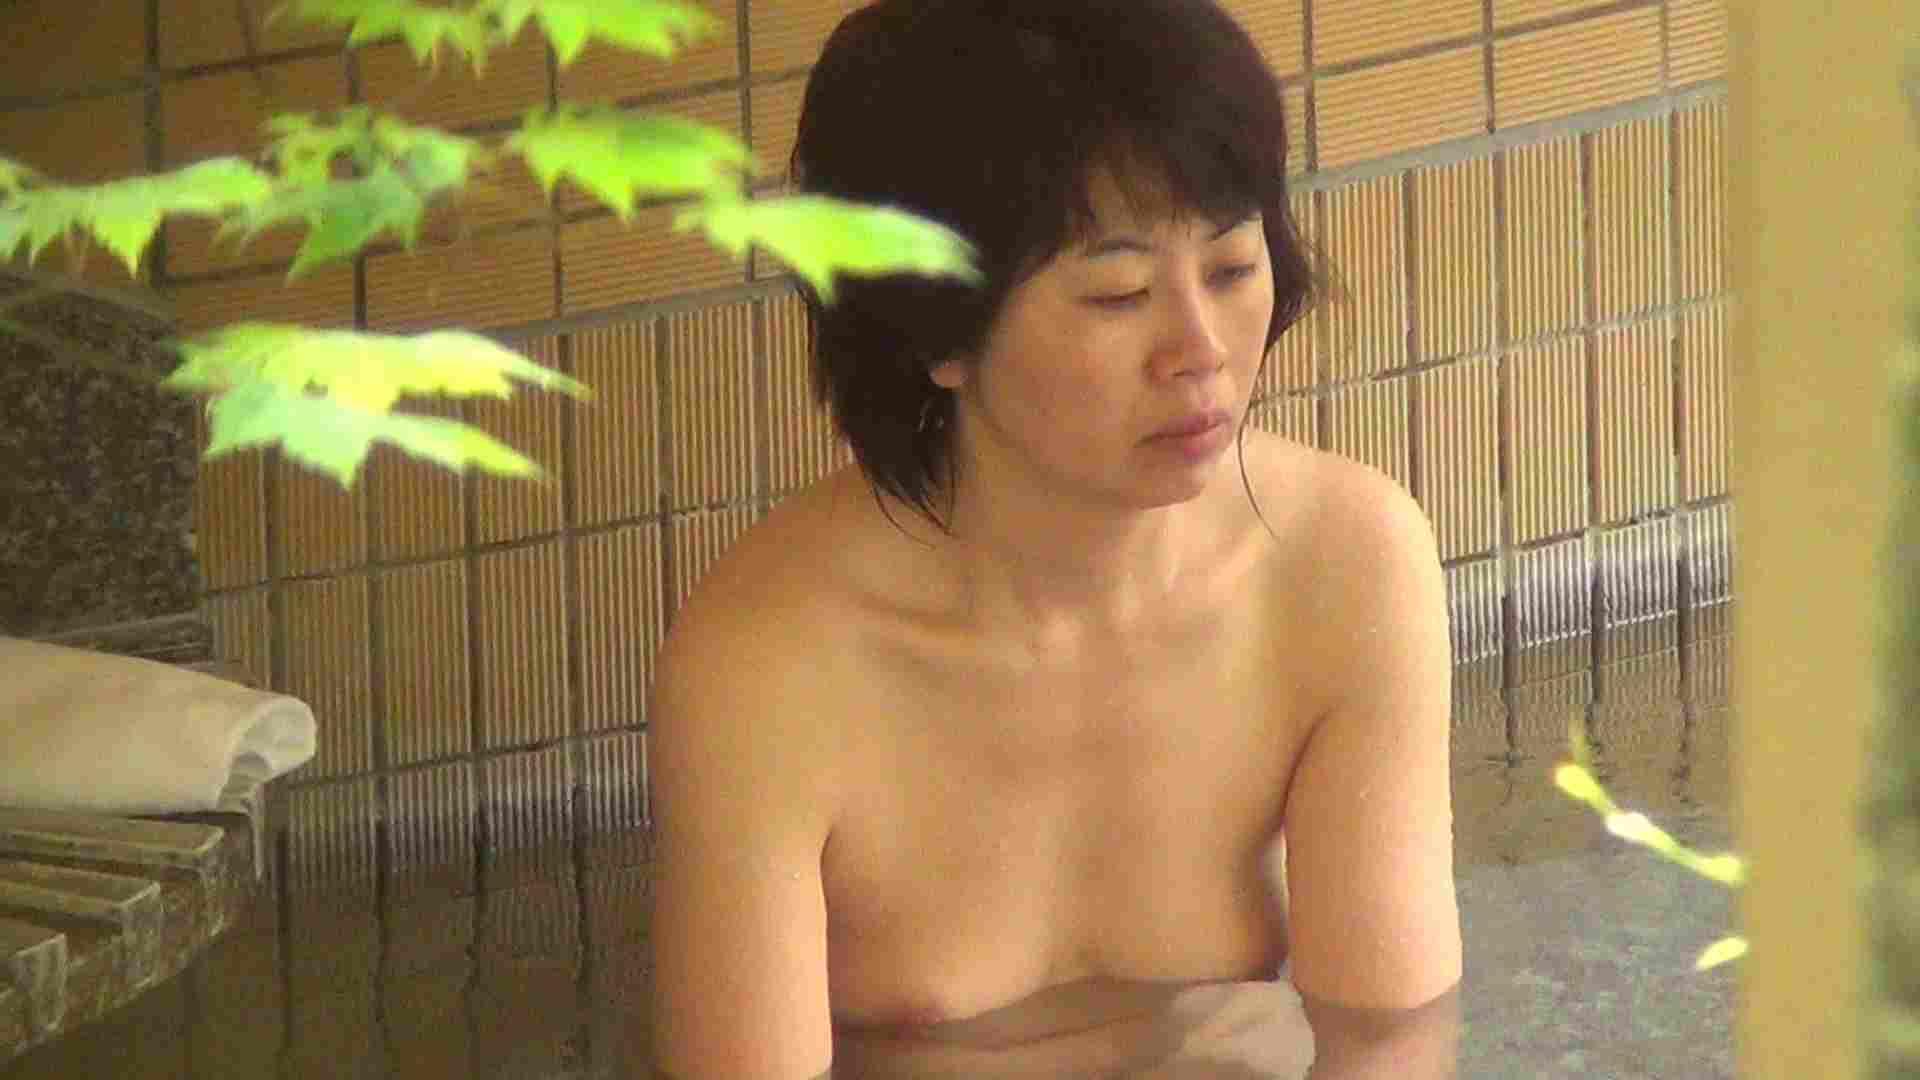 Aquaな露天風呂Vol.247 露天風呂編  87PIX 44